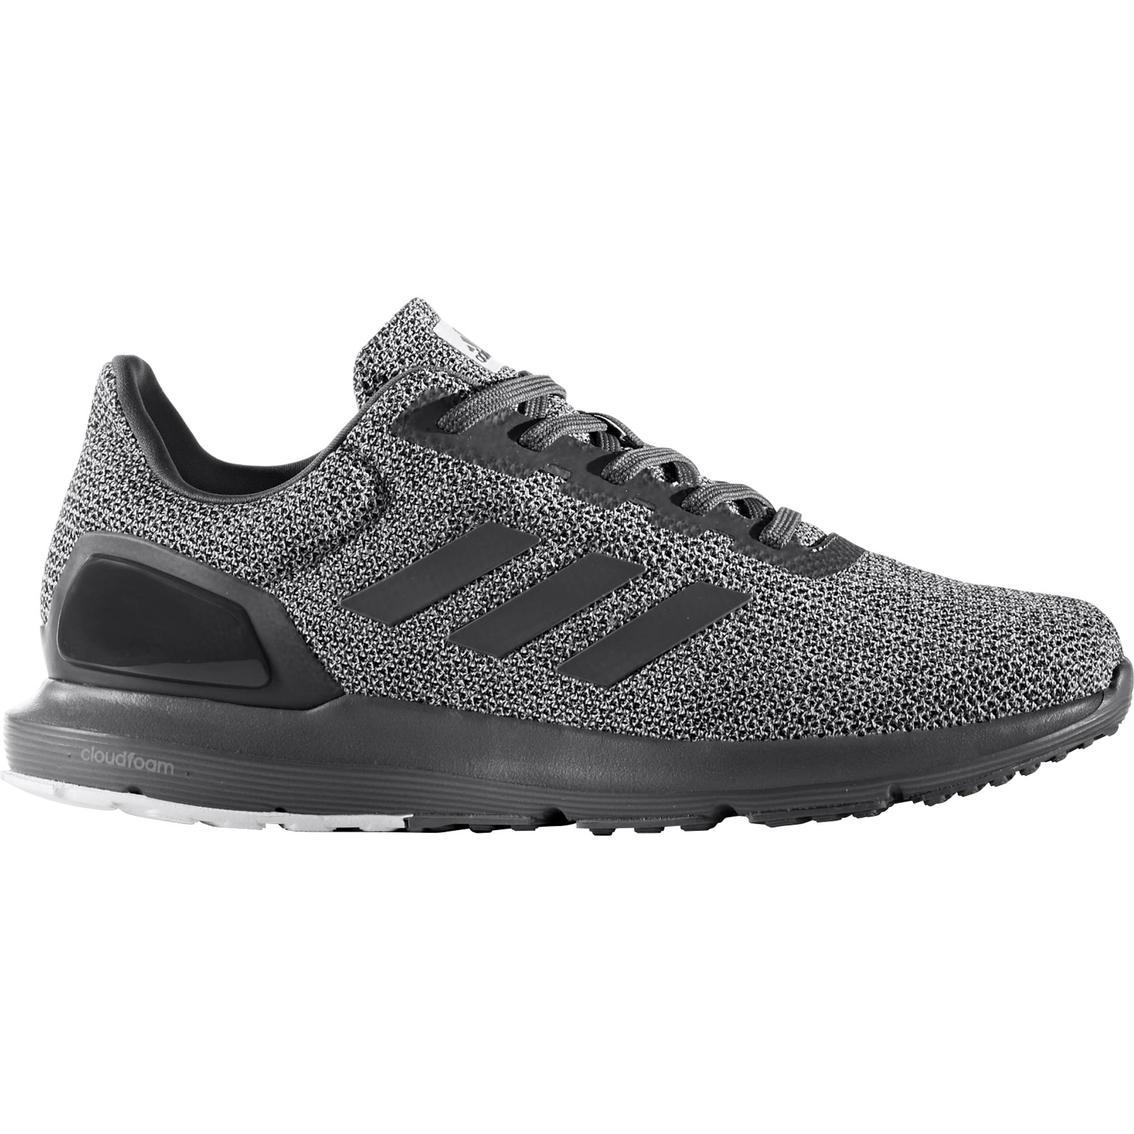 61cdc3931 adidas Men s Cosmic 2 SL Running Shoes